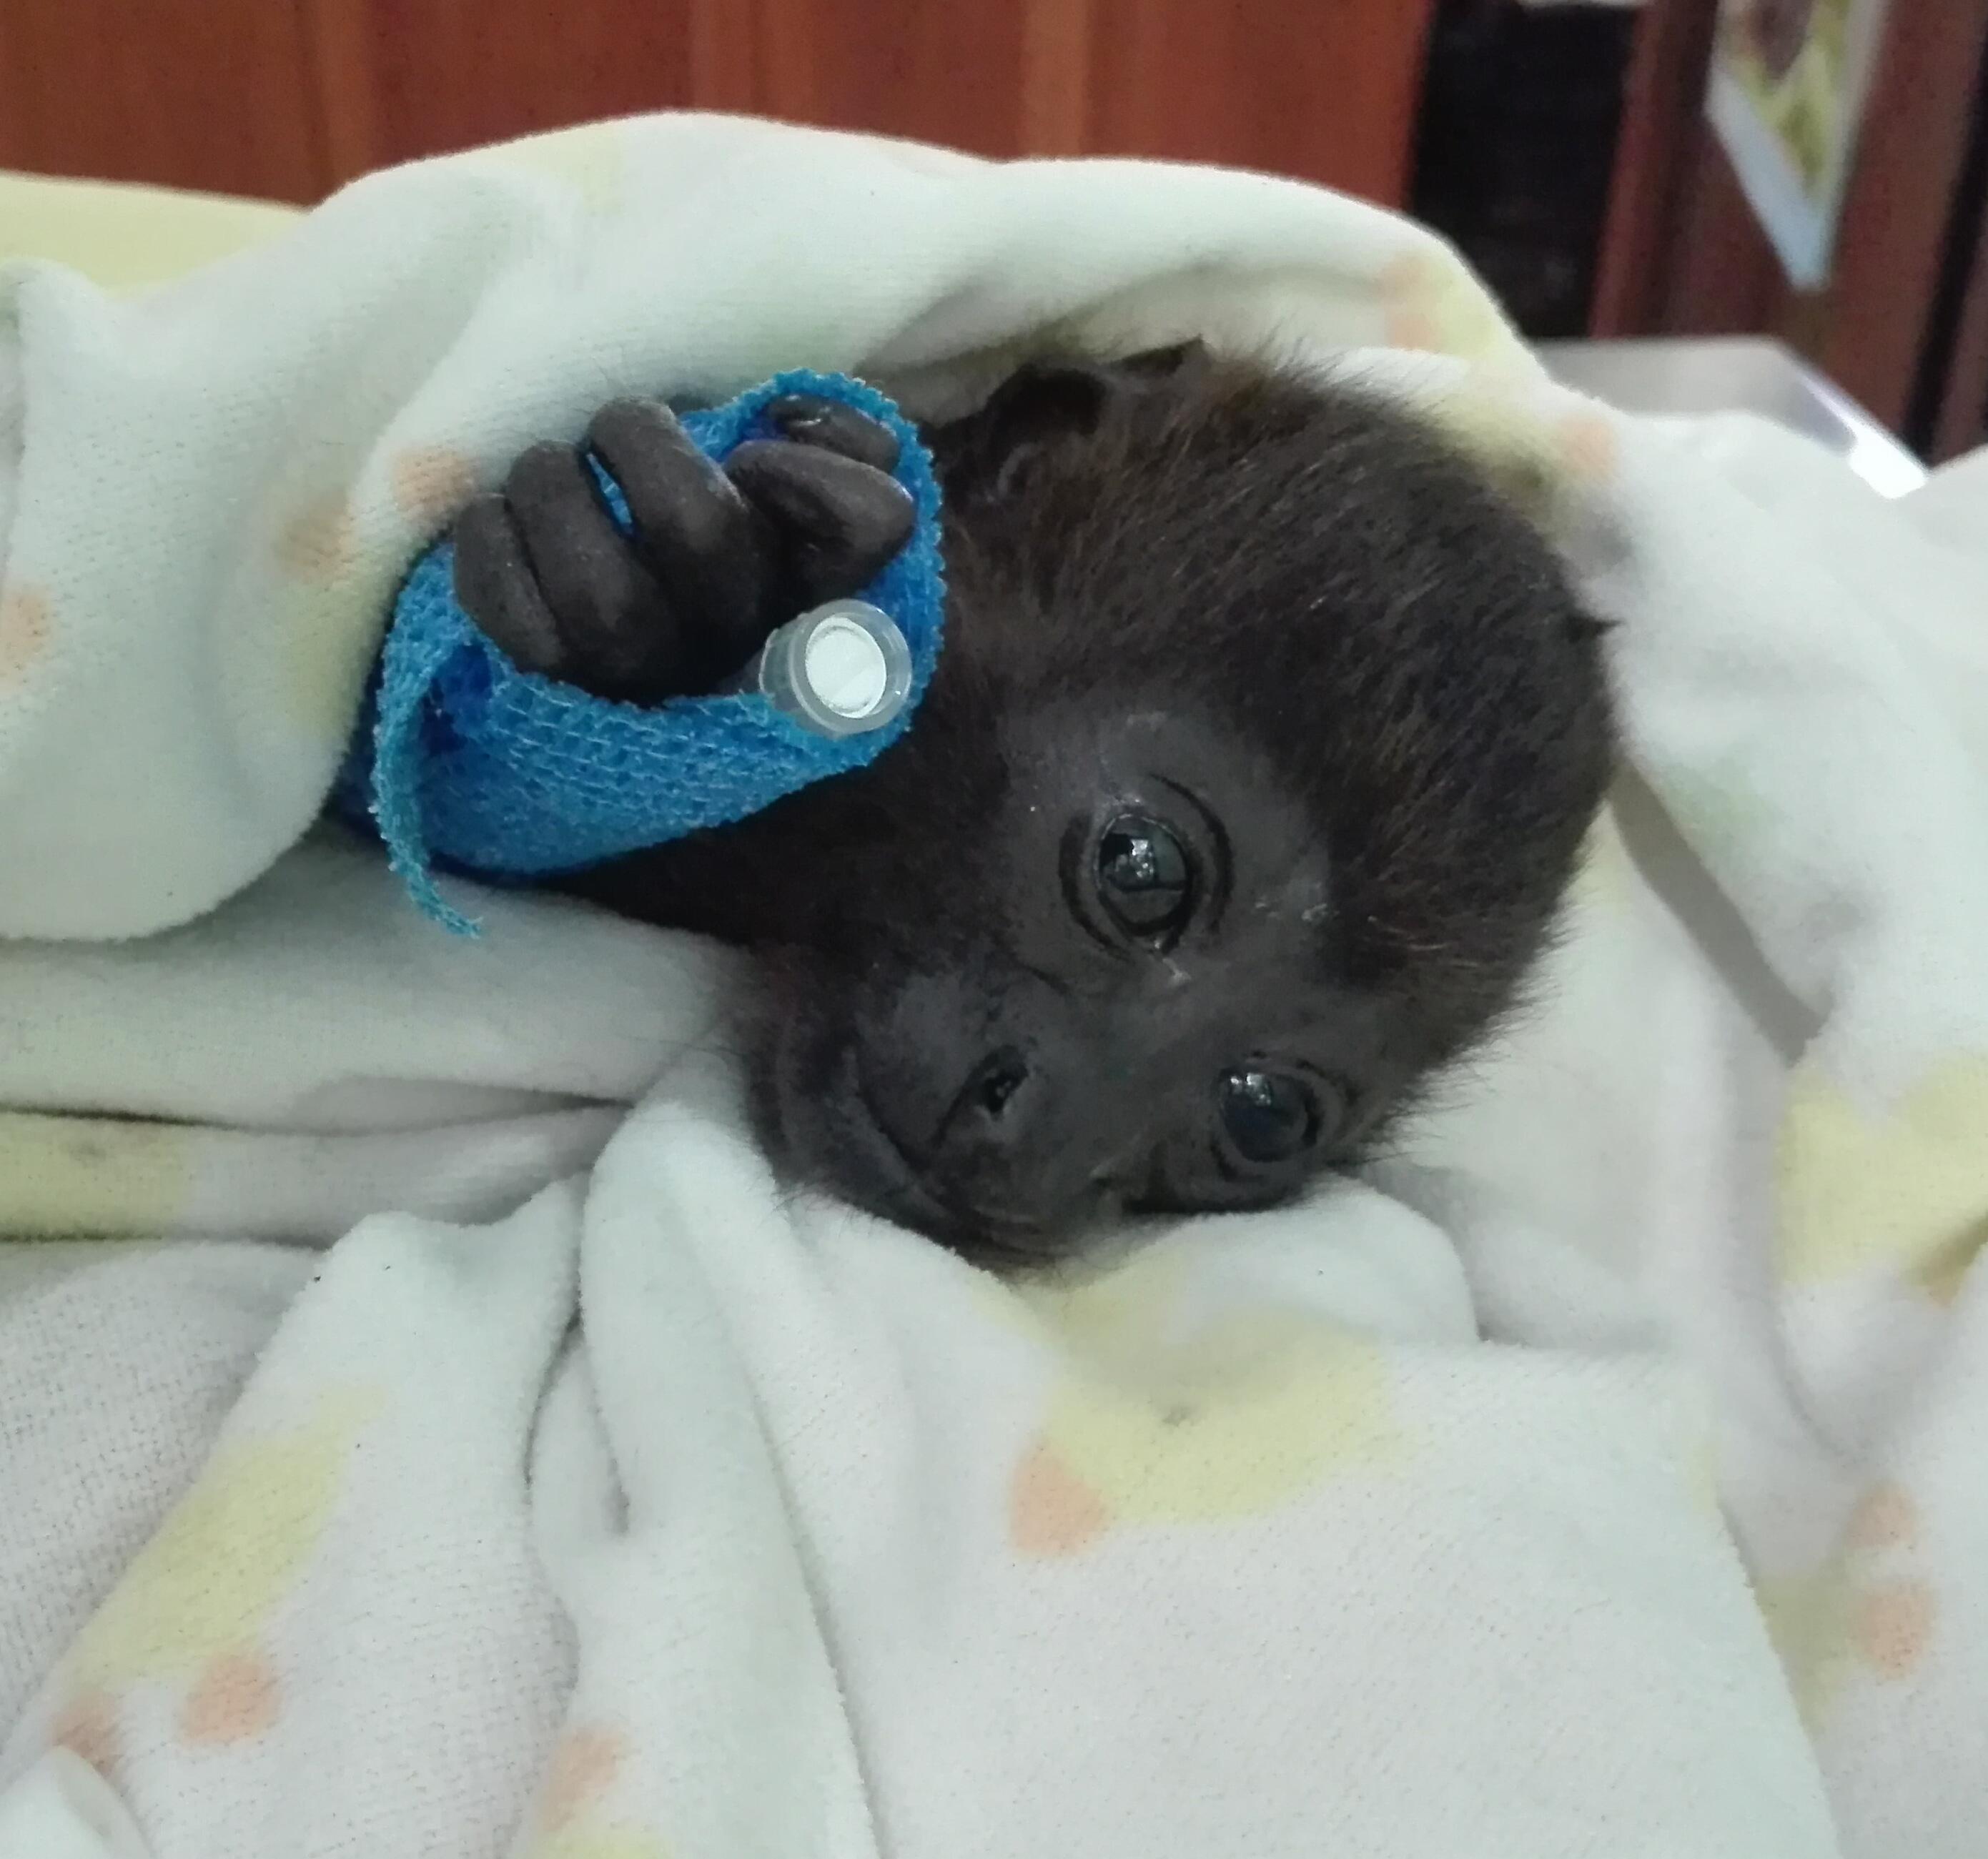 Cleo the monkey